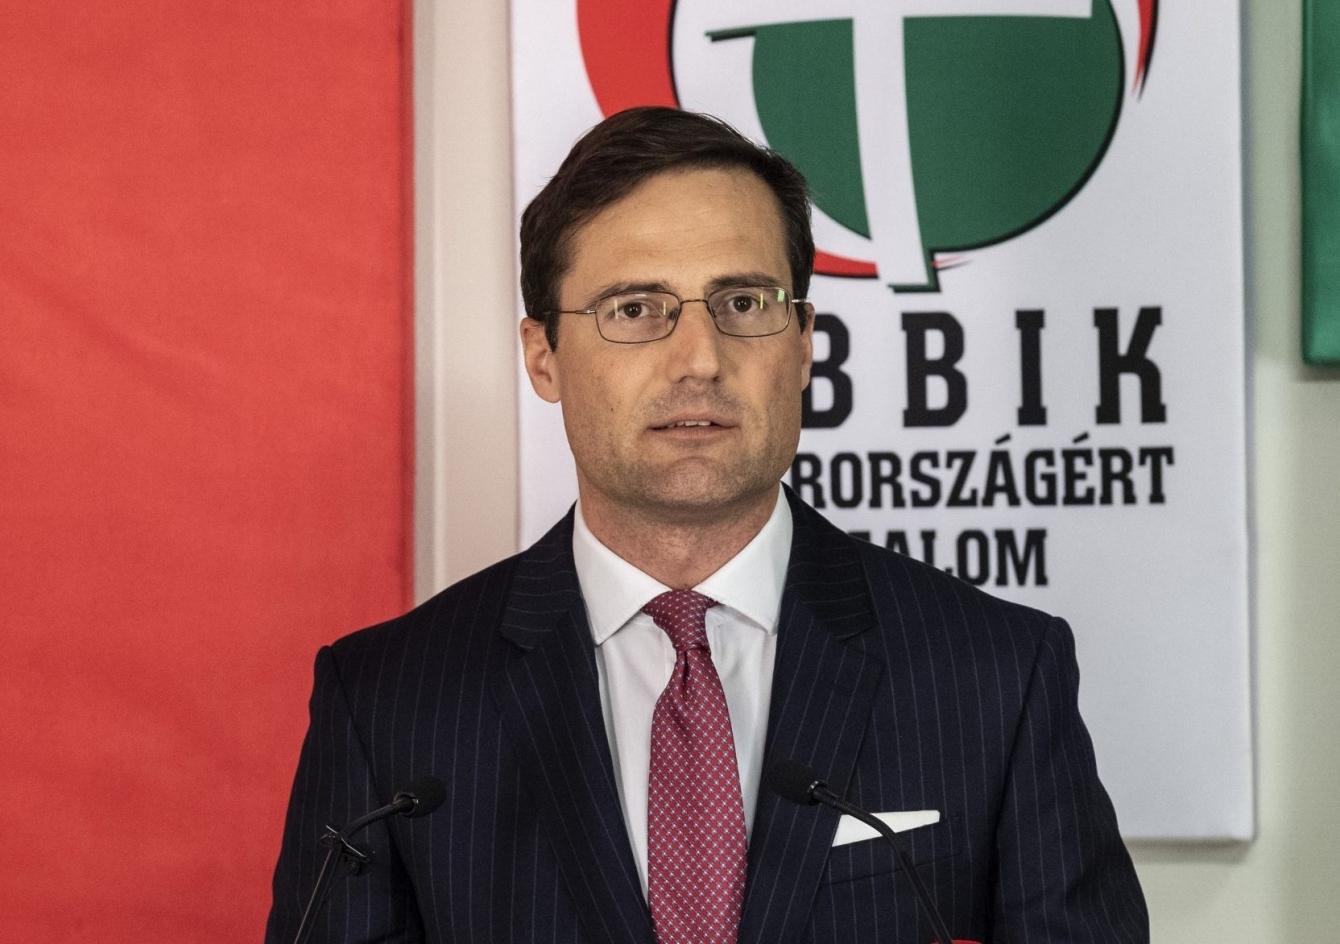 ¿Cristianos o cristianistas? La carta del vicepresidente de Jobbik